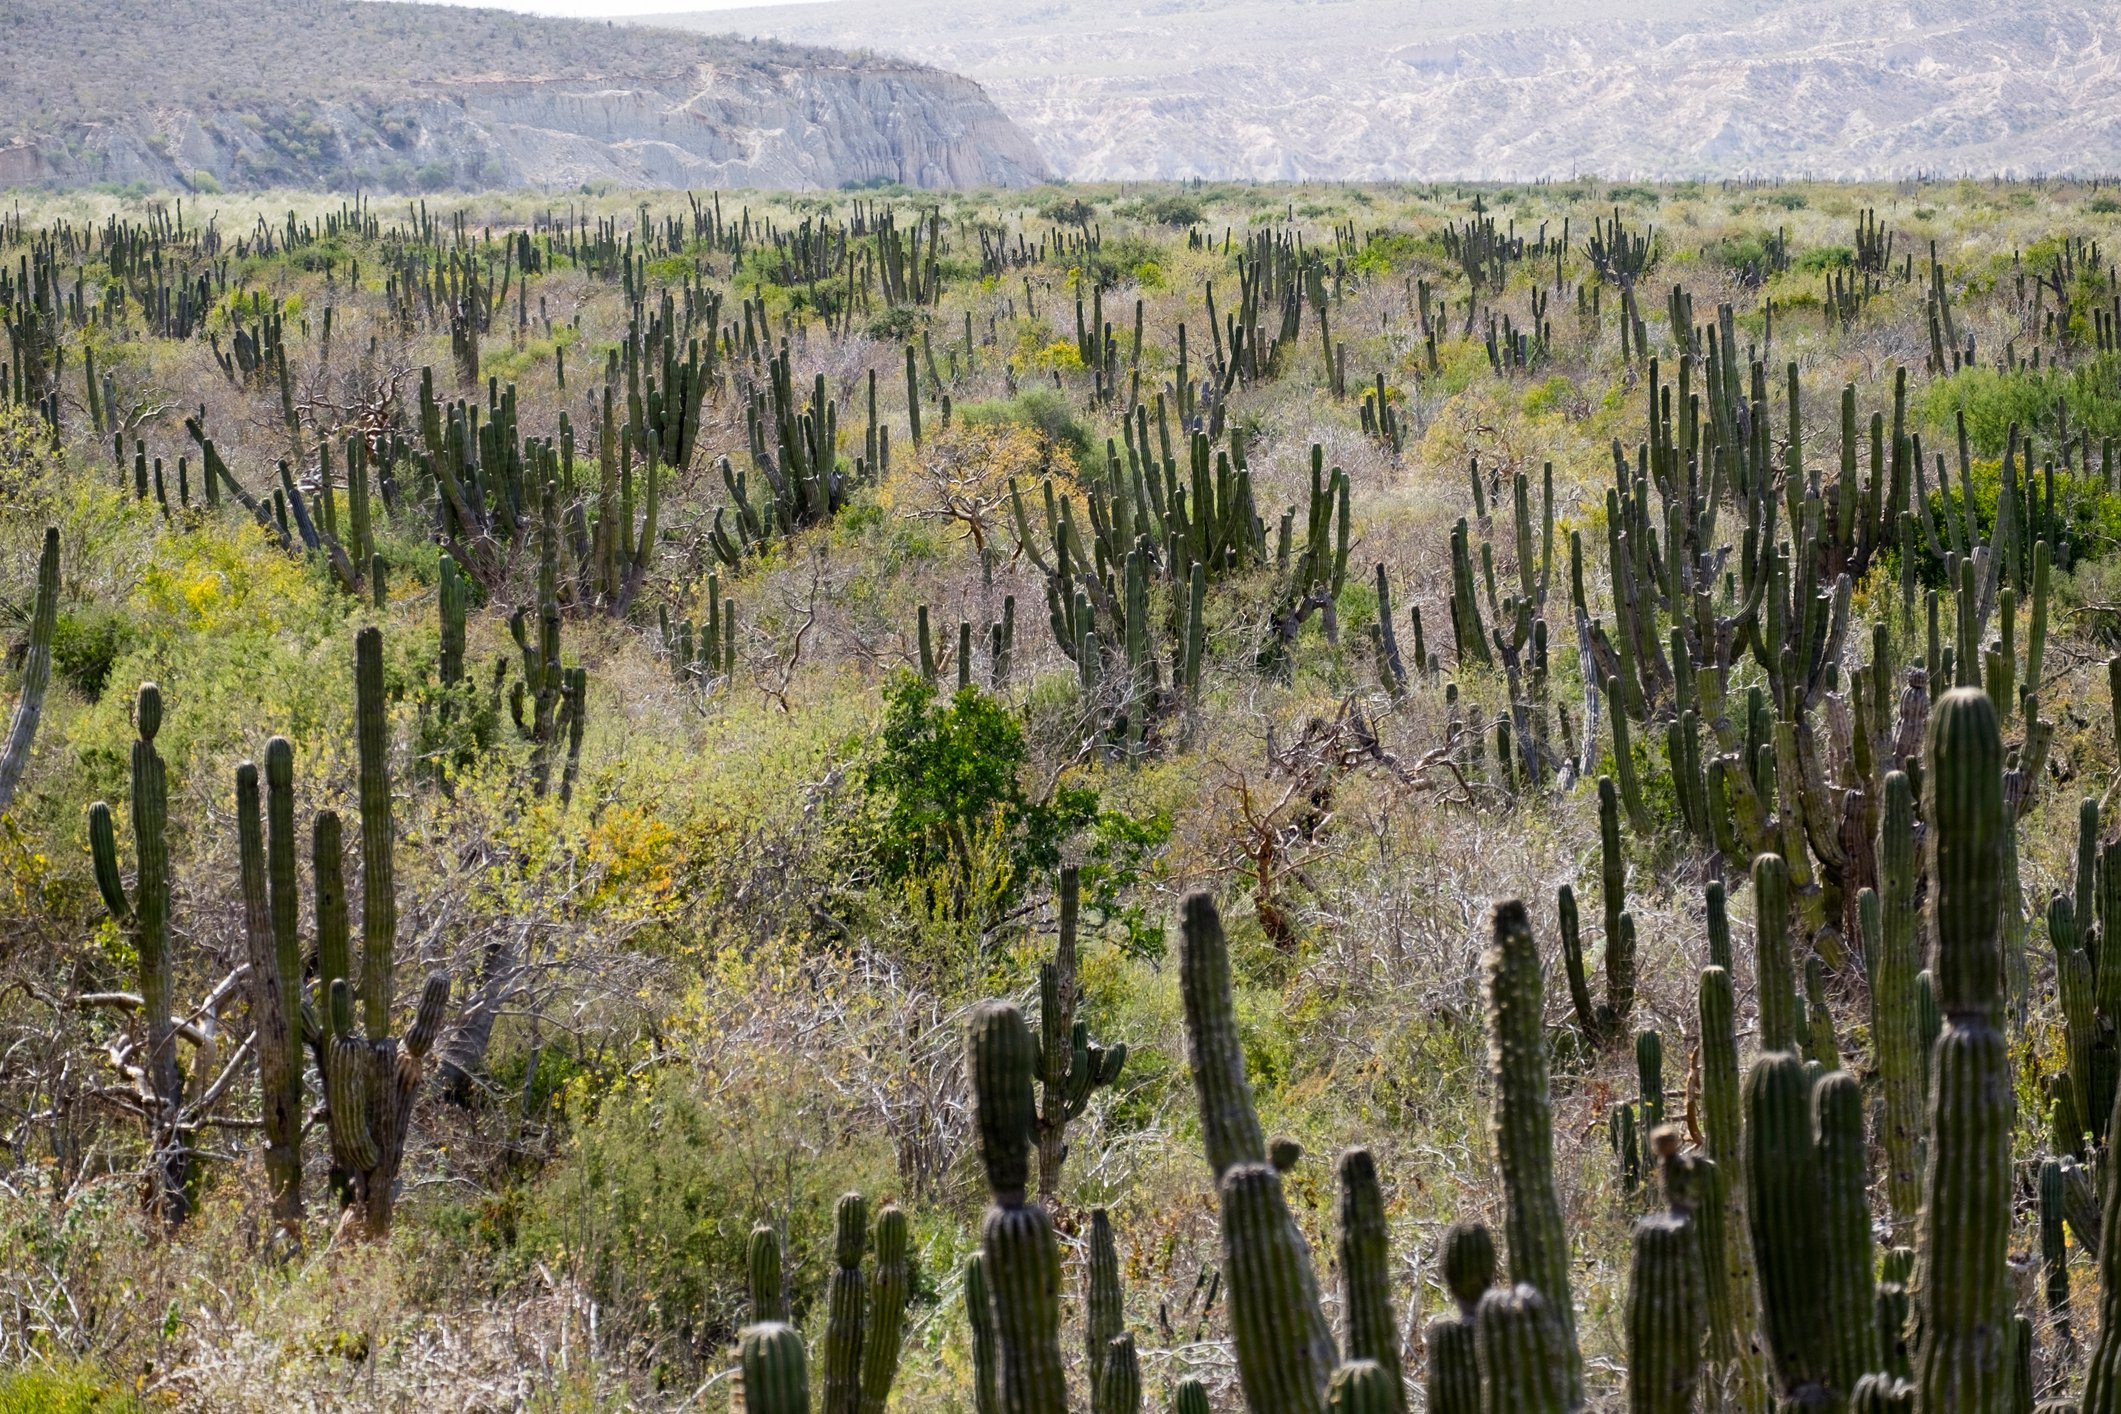 fields in Mexico